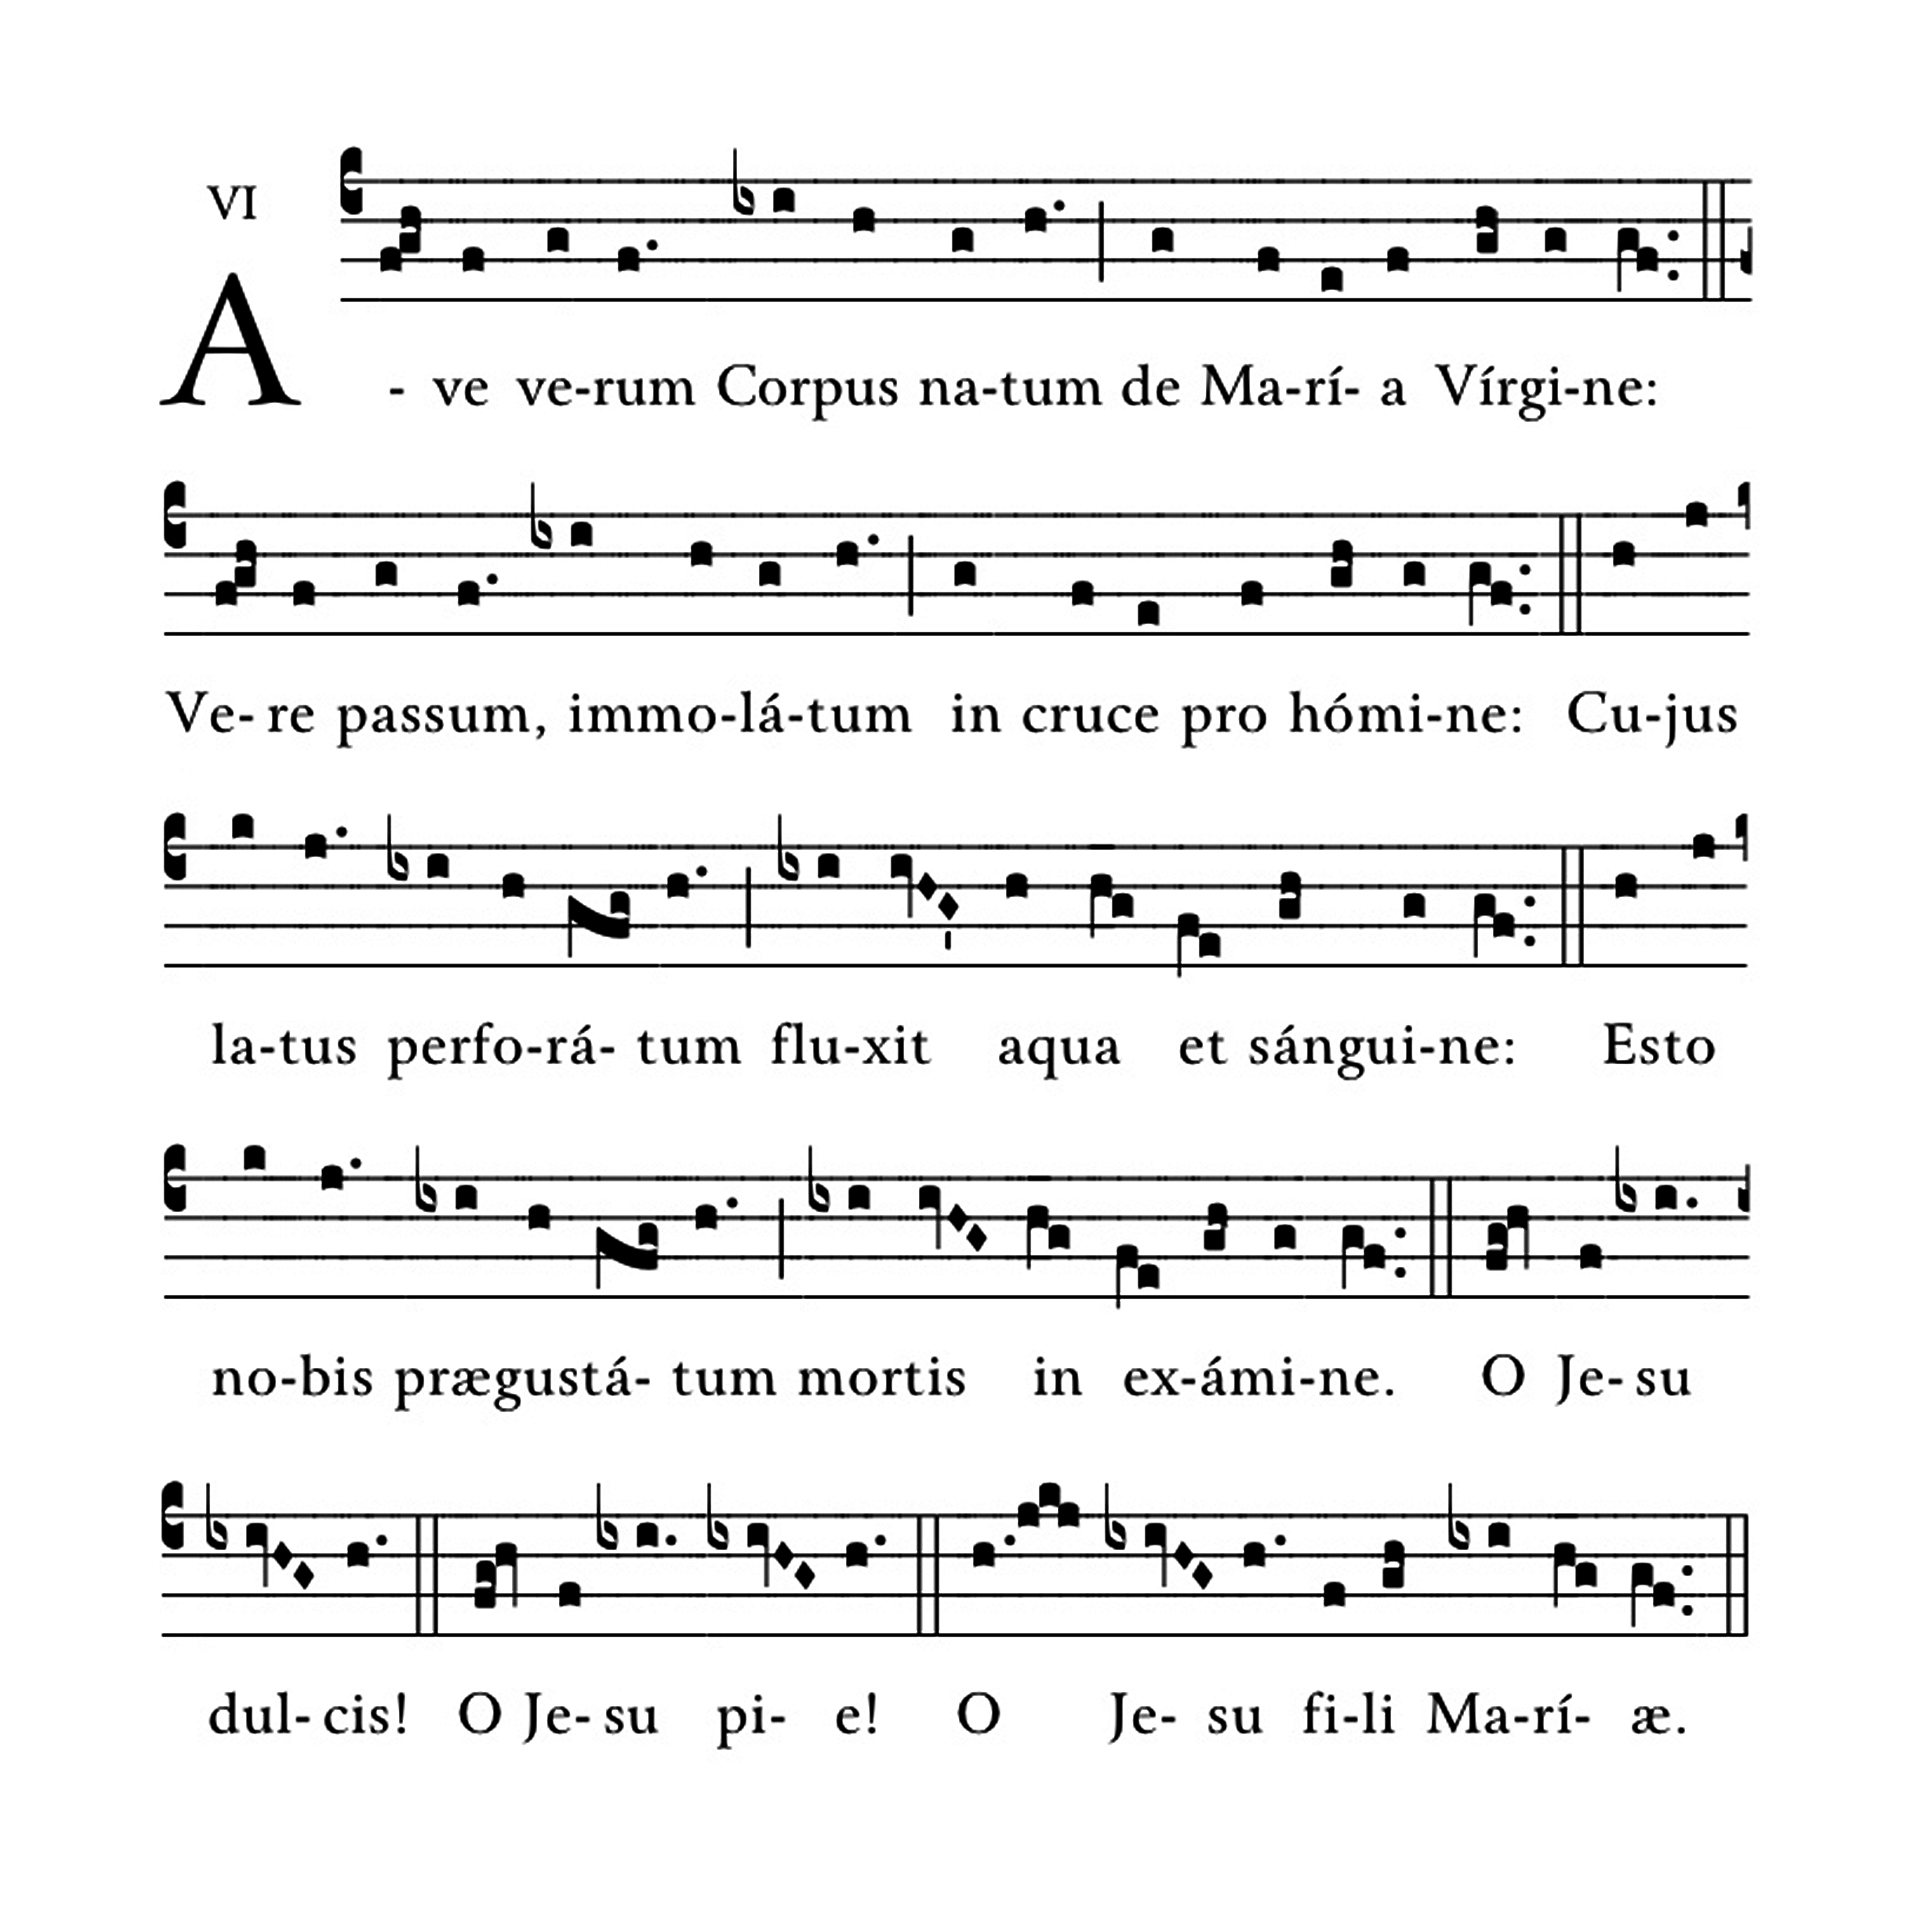 Ave verum Corpus - notacja